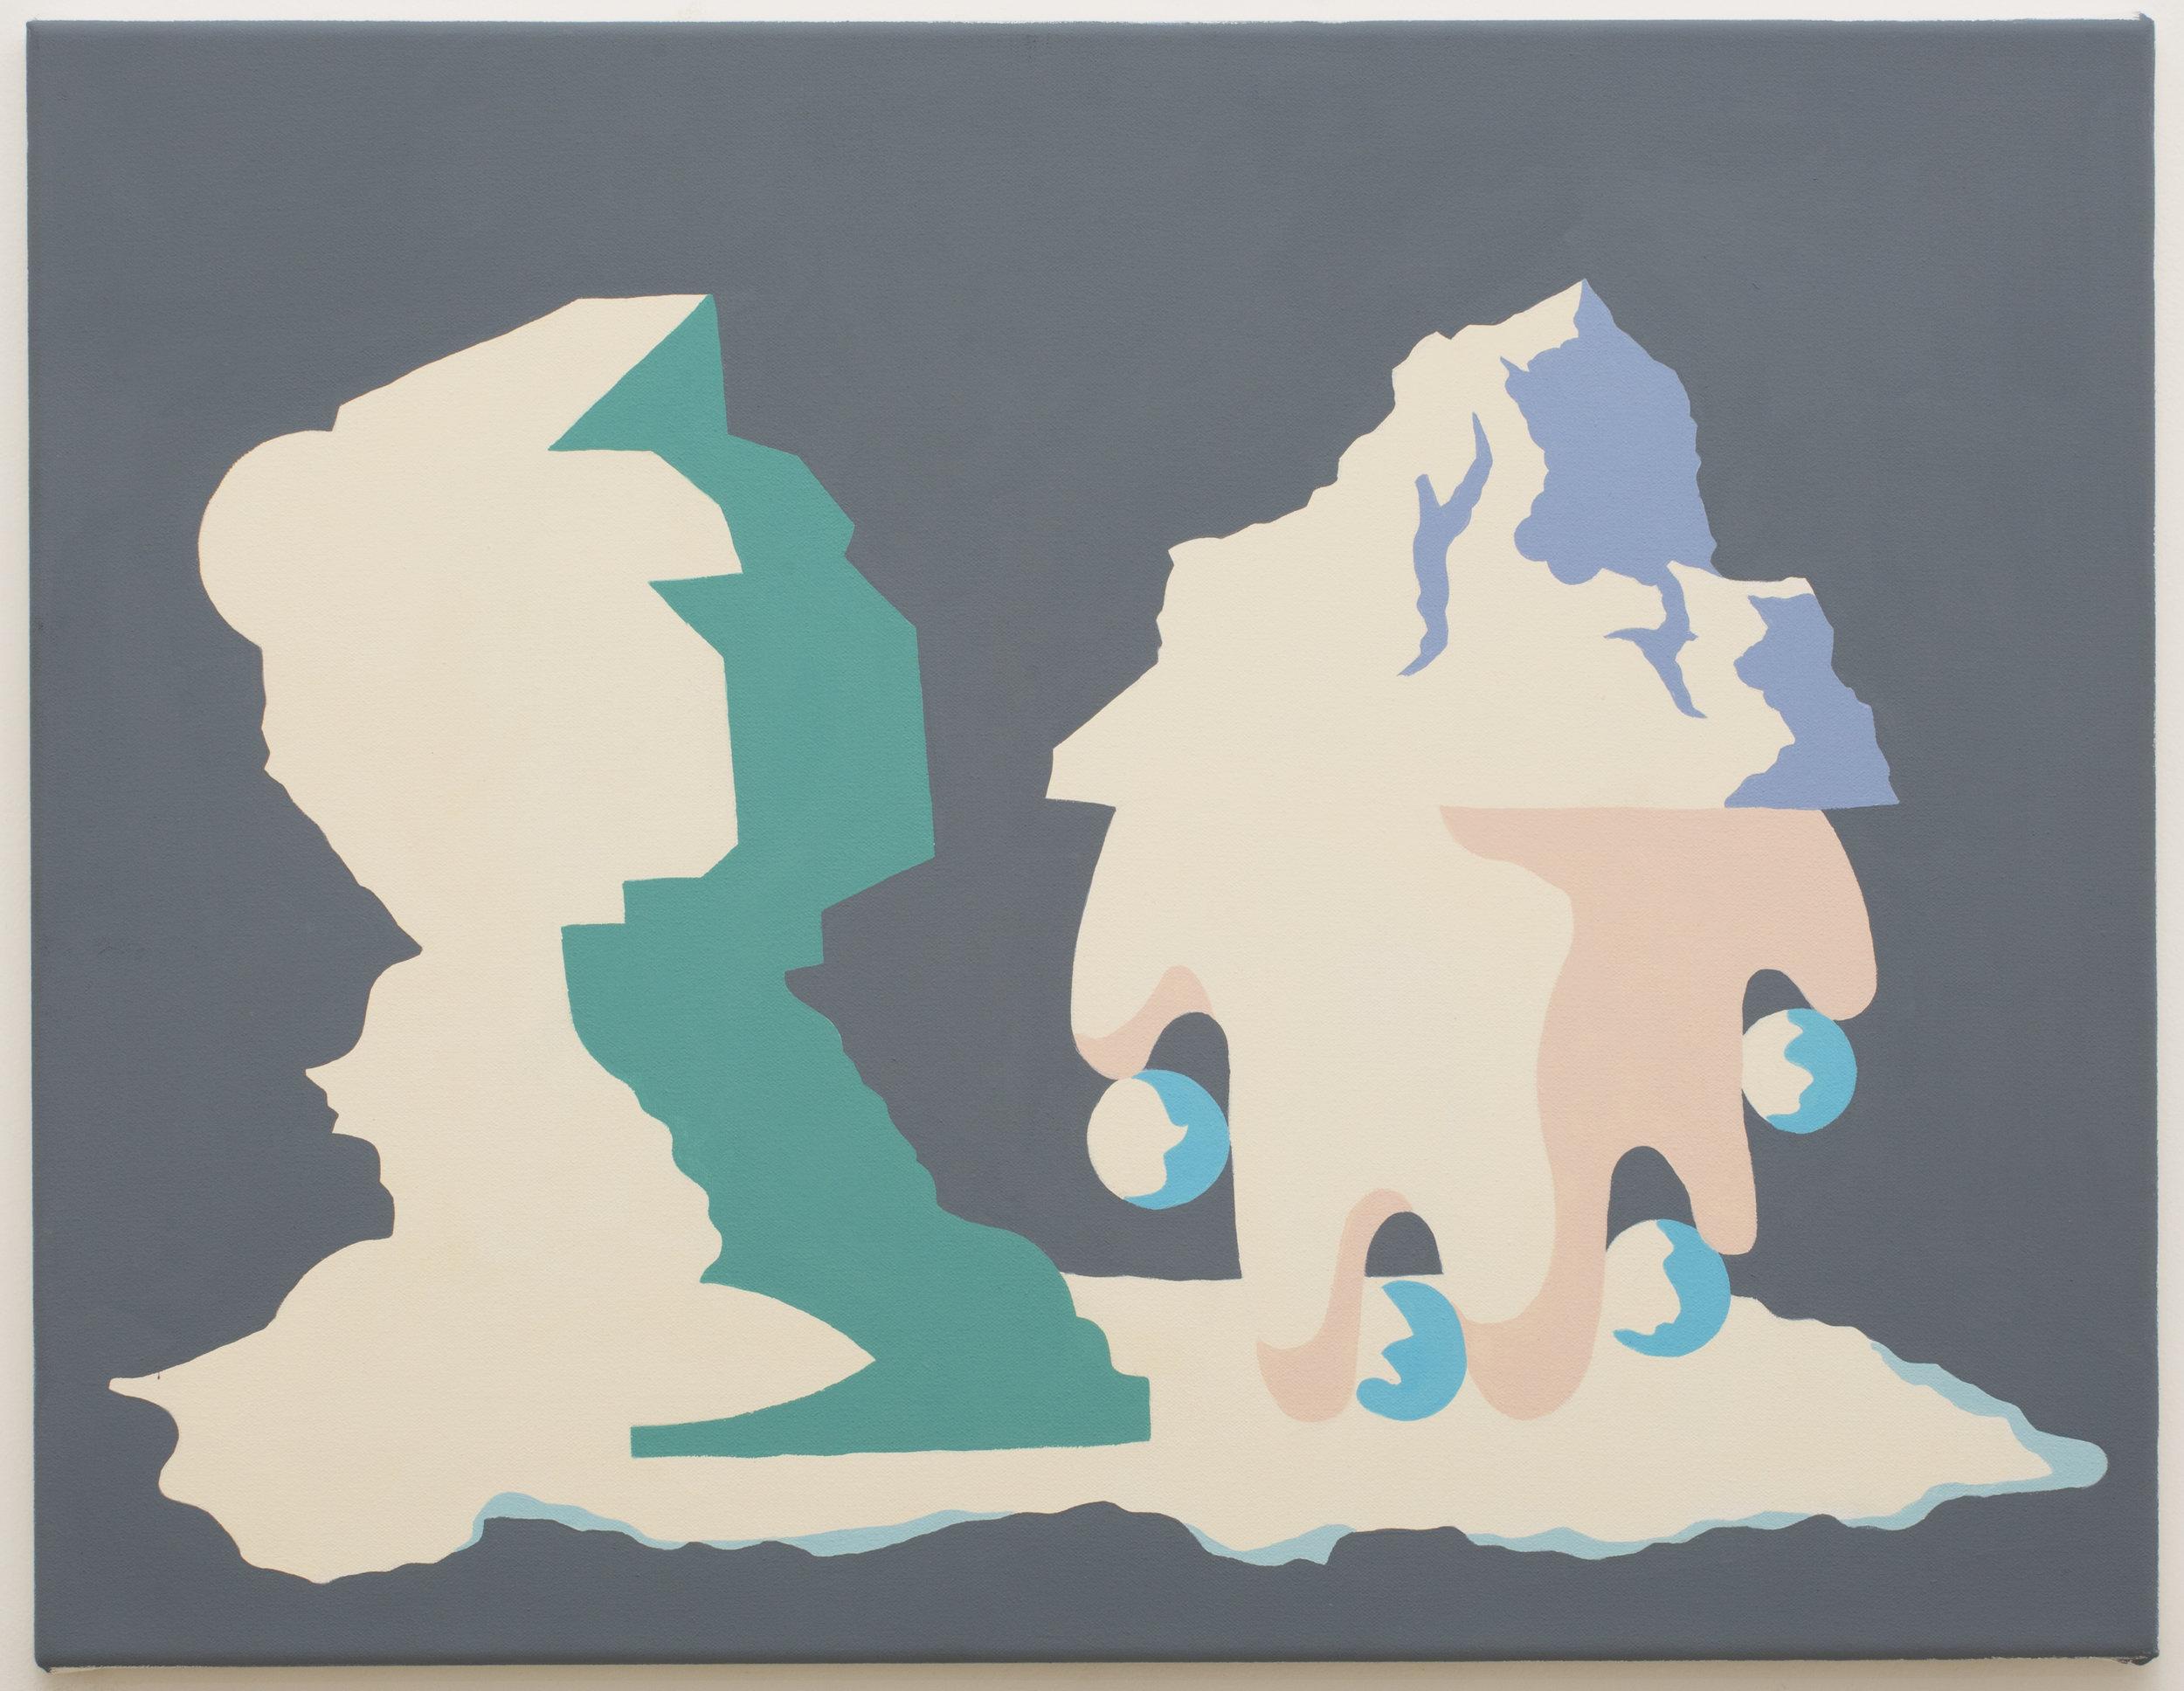 MICHELLE HANLIN  Sculptural Display  2018  Vinyl paint on canvas 51.5 x 66 cm